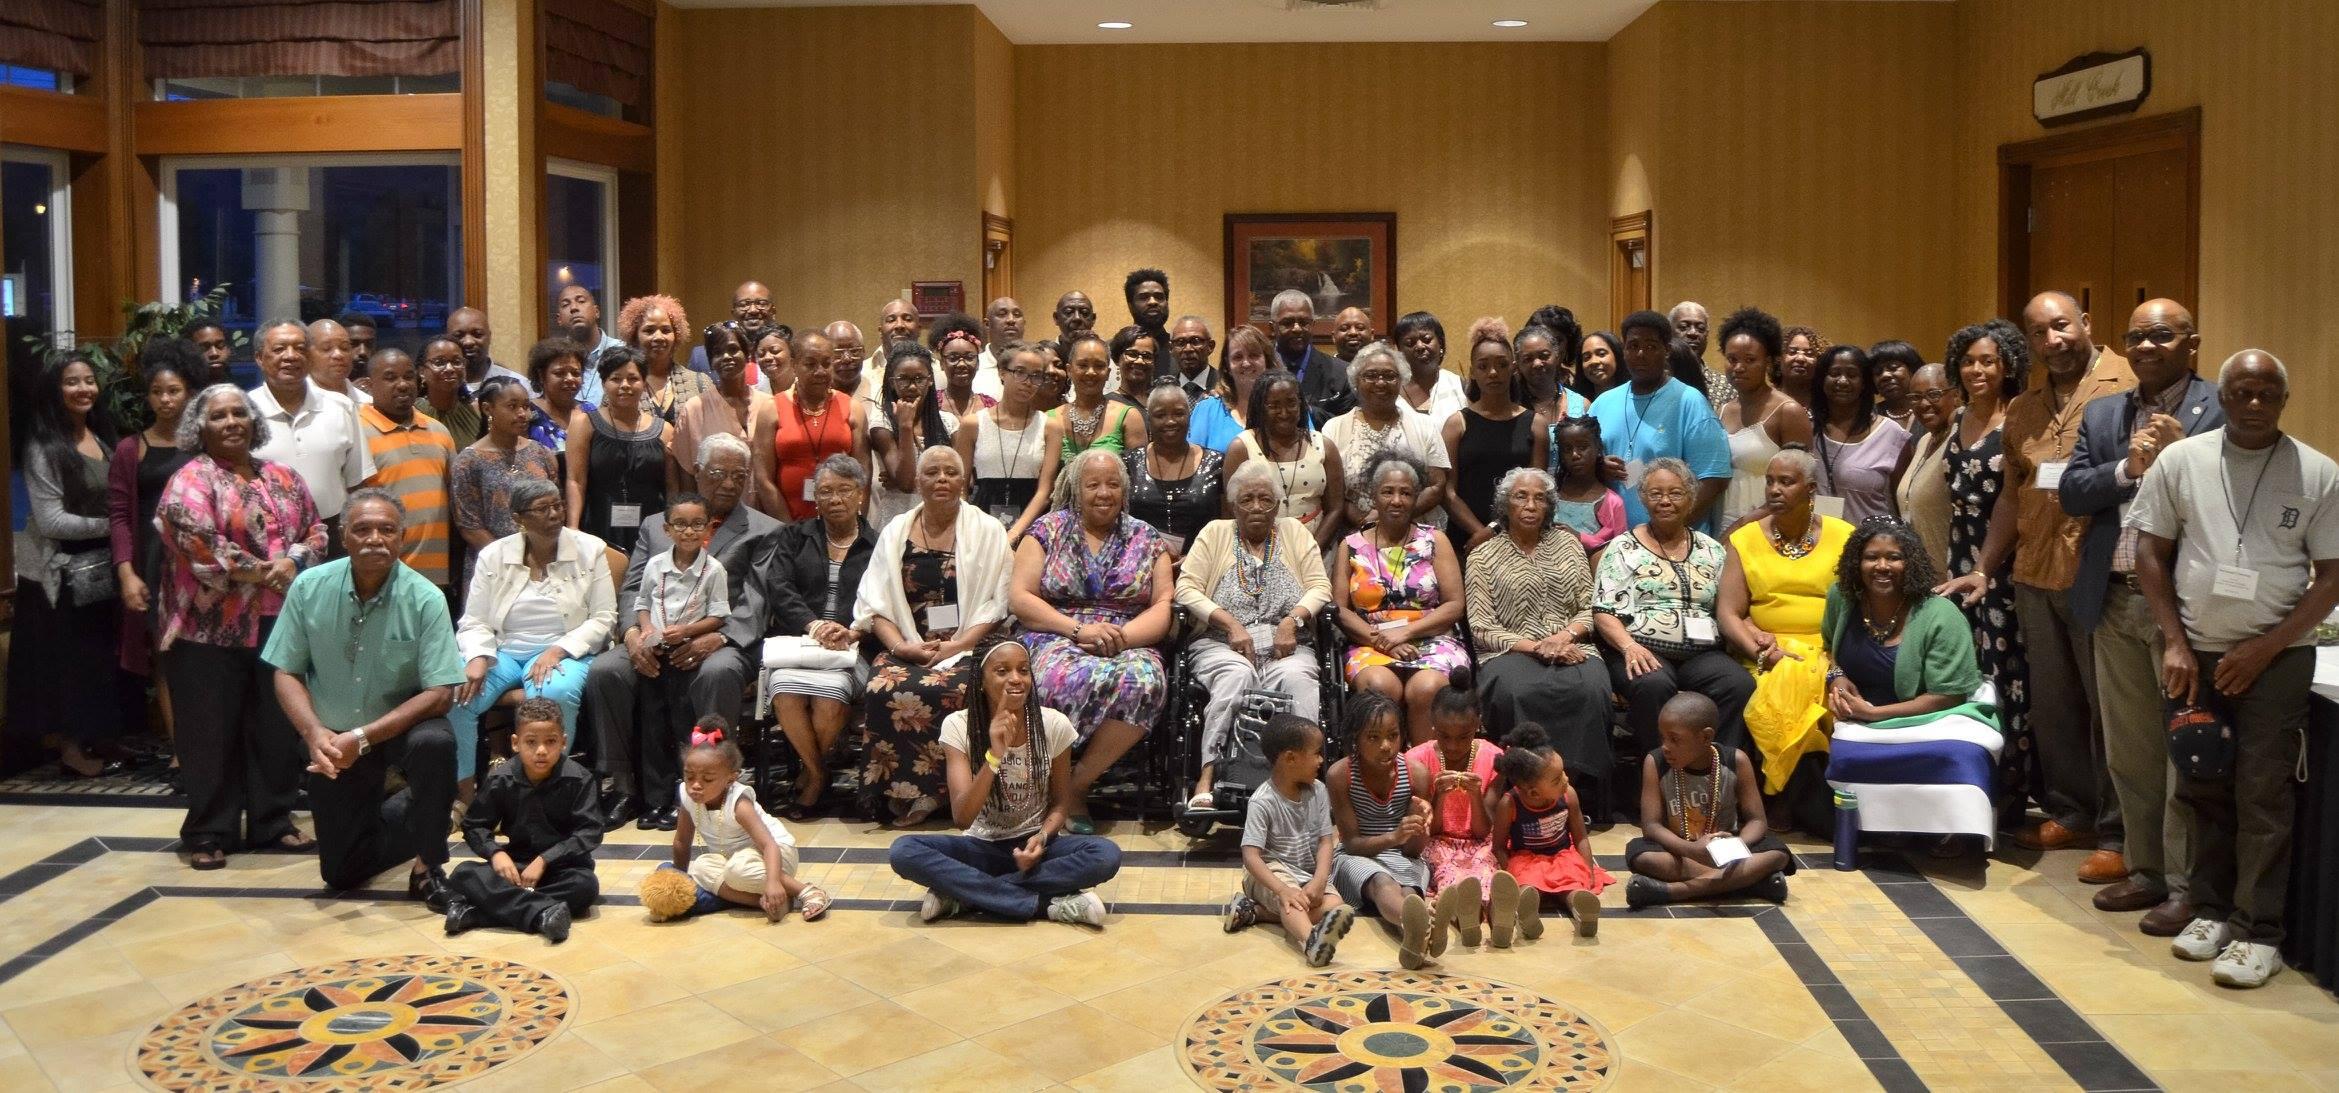 Harford Tait Family